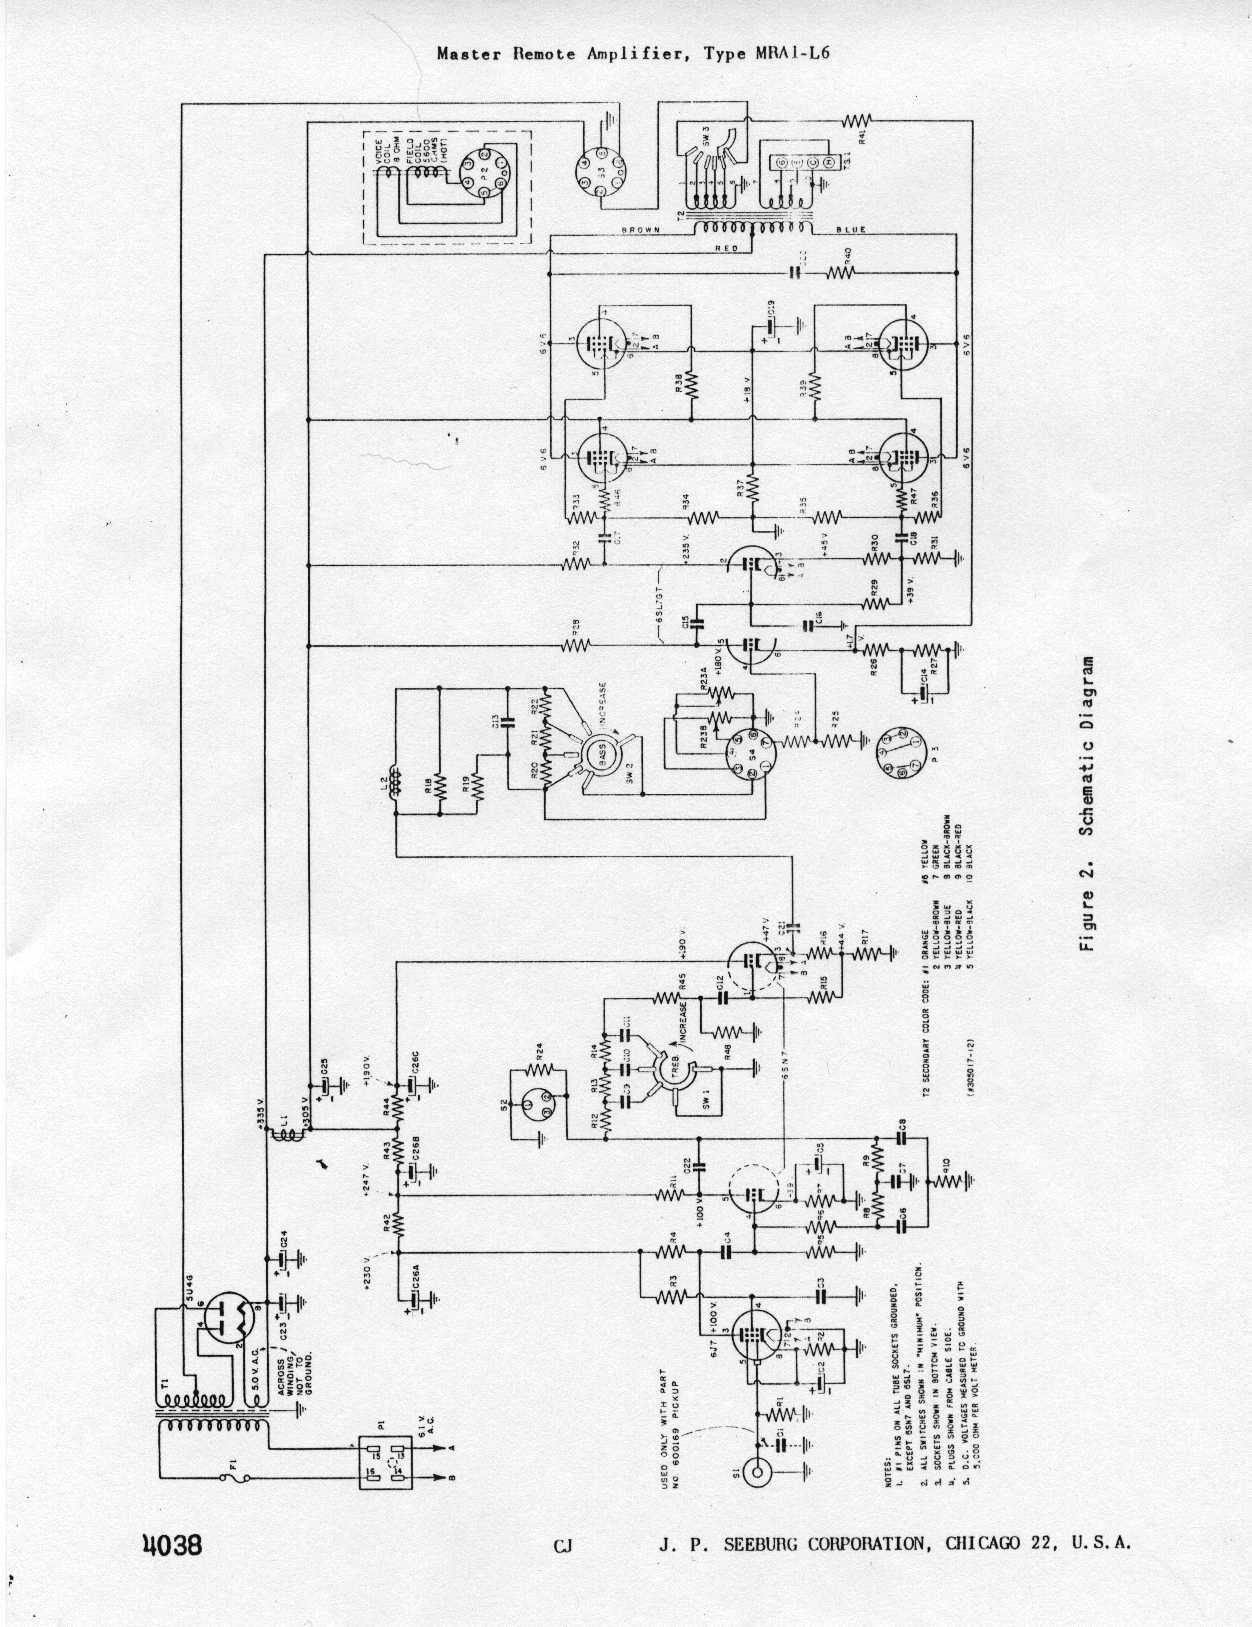 Remote Vol Wiring